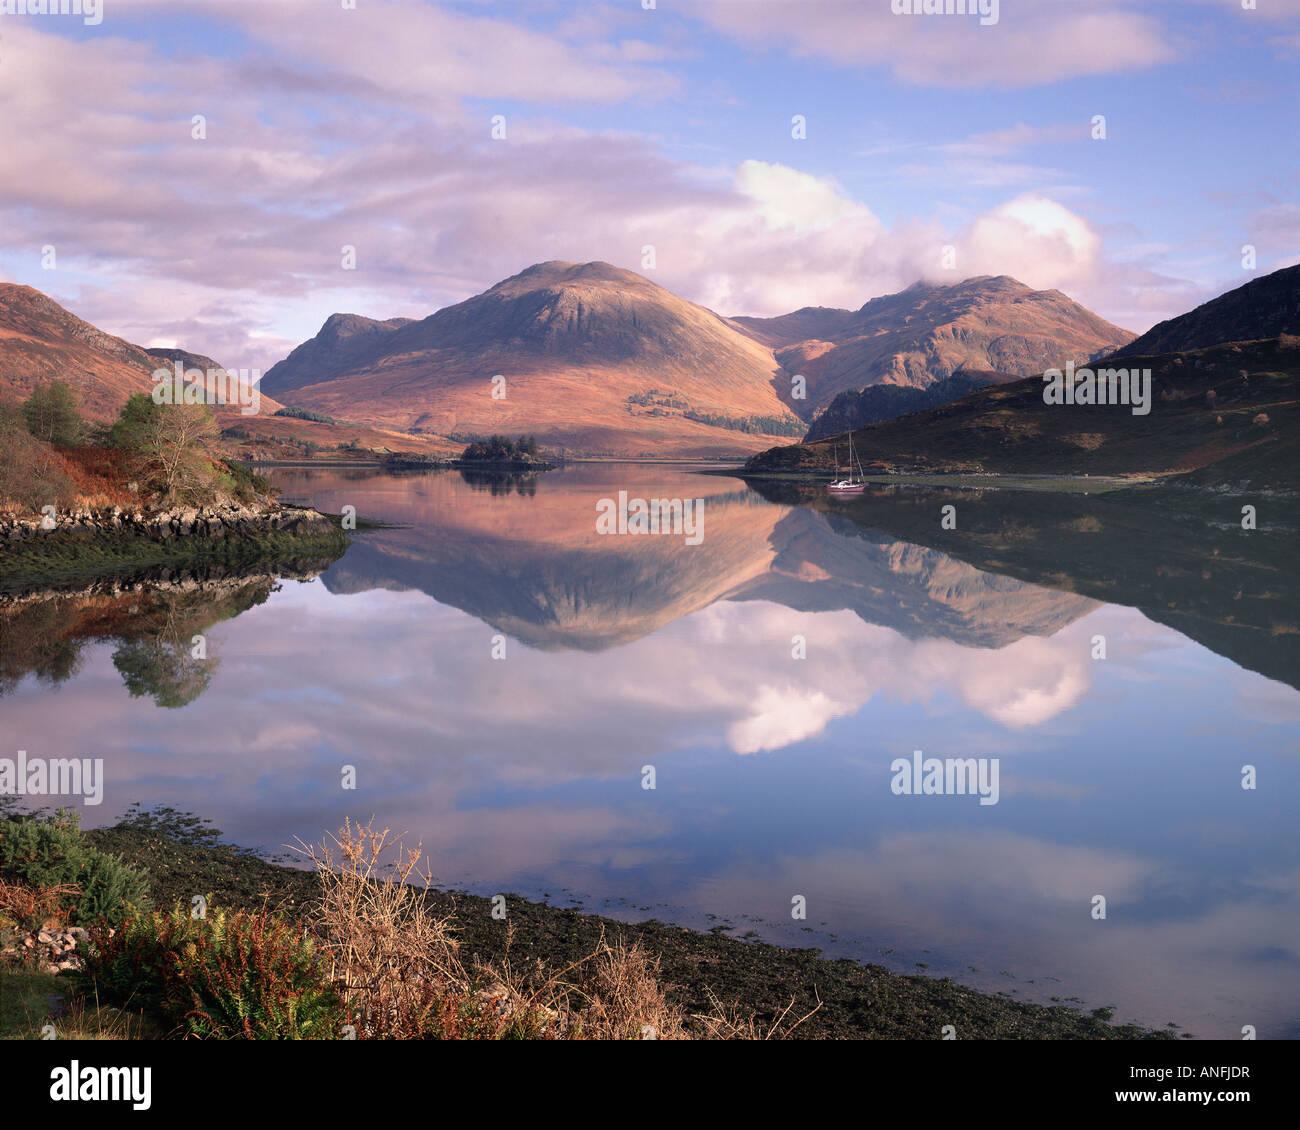 GB - SCOTLAND:  Evening at Loch Long - Stock Image